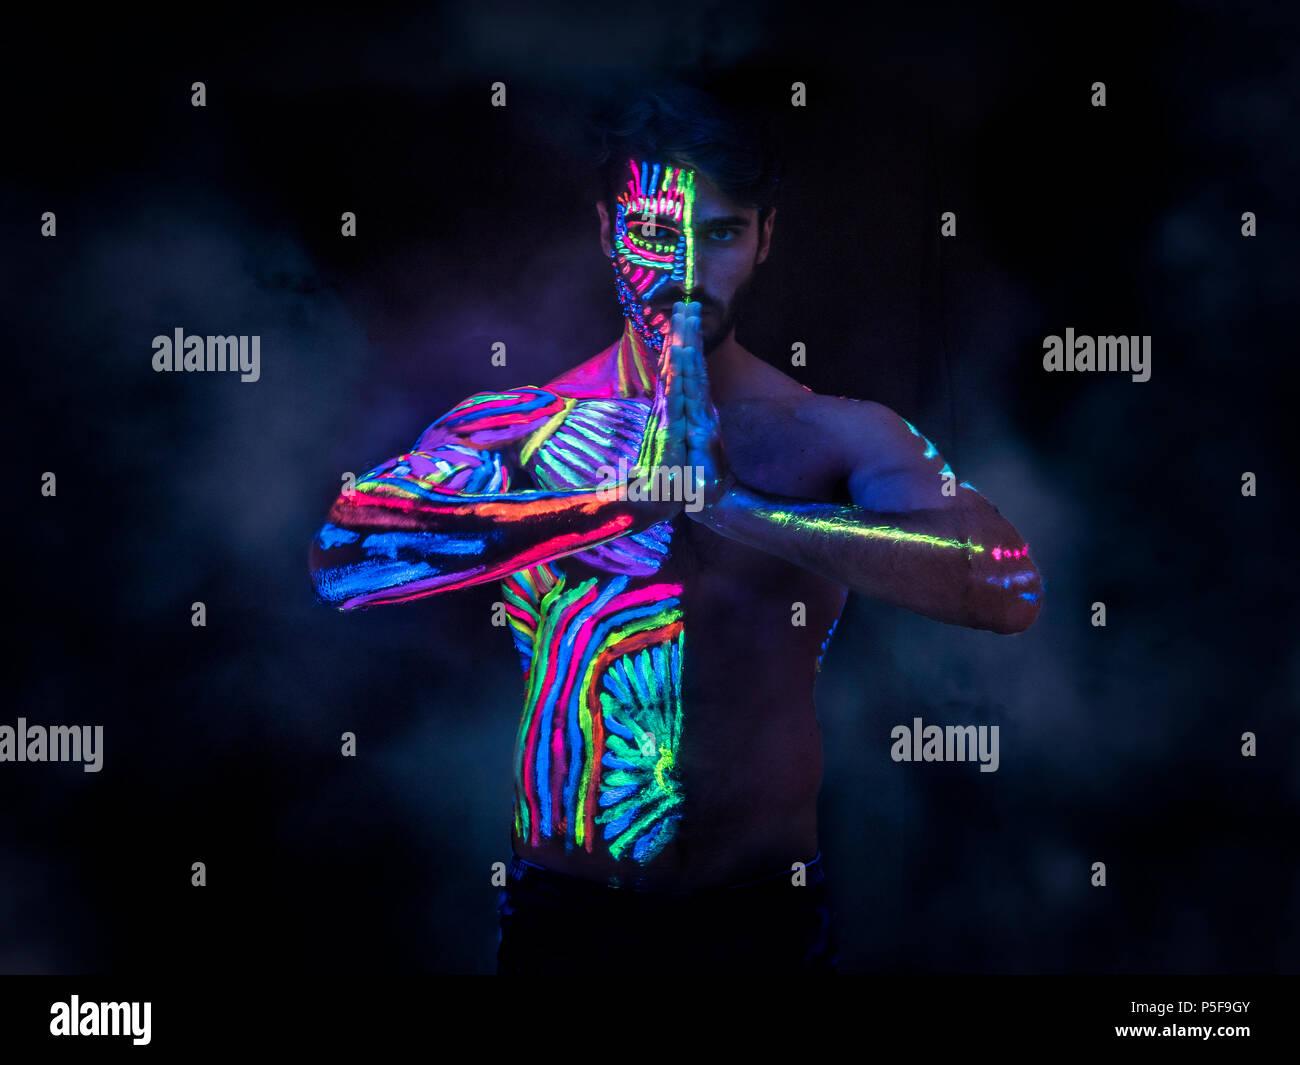 Vernici Fluorescenti Per Pareti.Vernice Fluorescente Immagini Vernice Fluorescente Fotos Stock Alamy